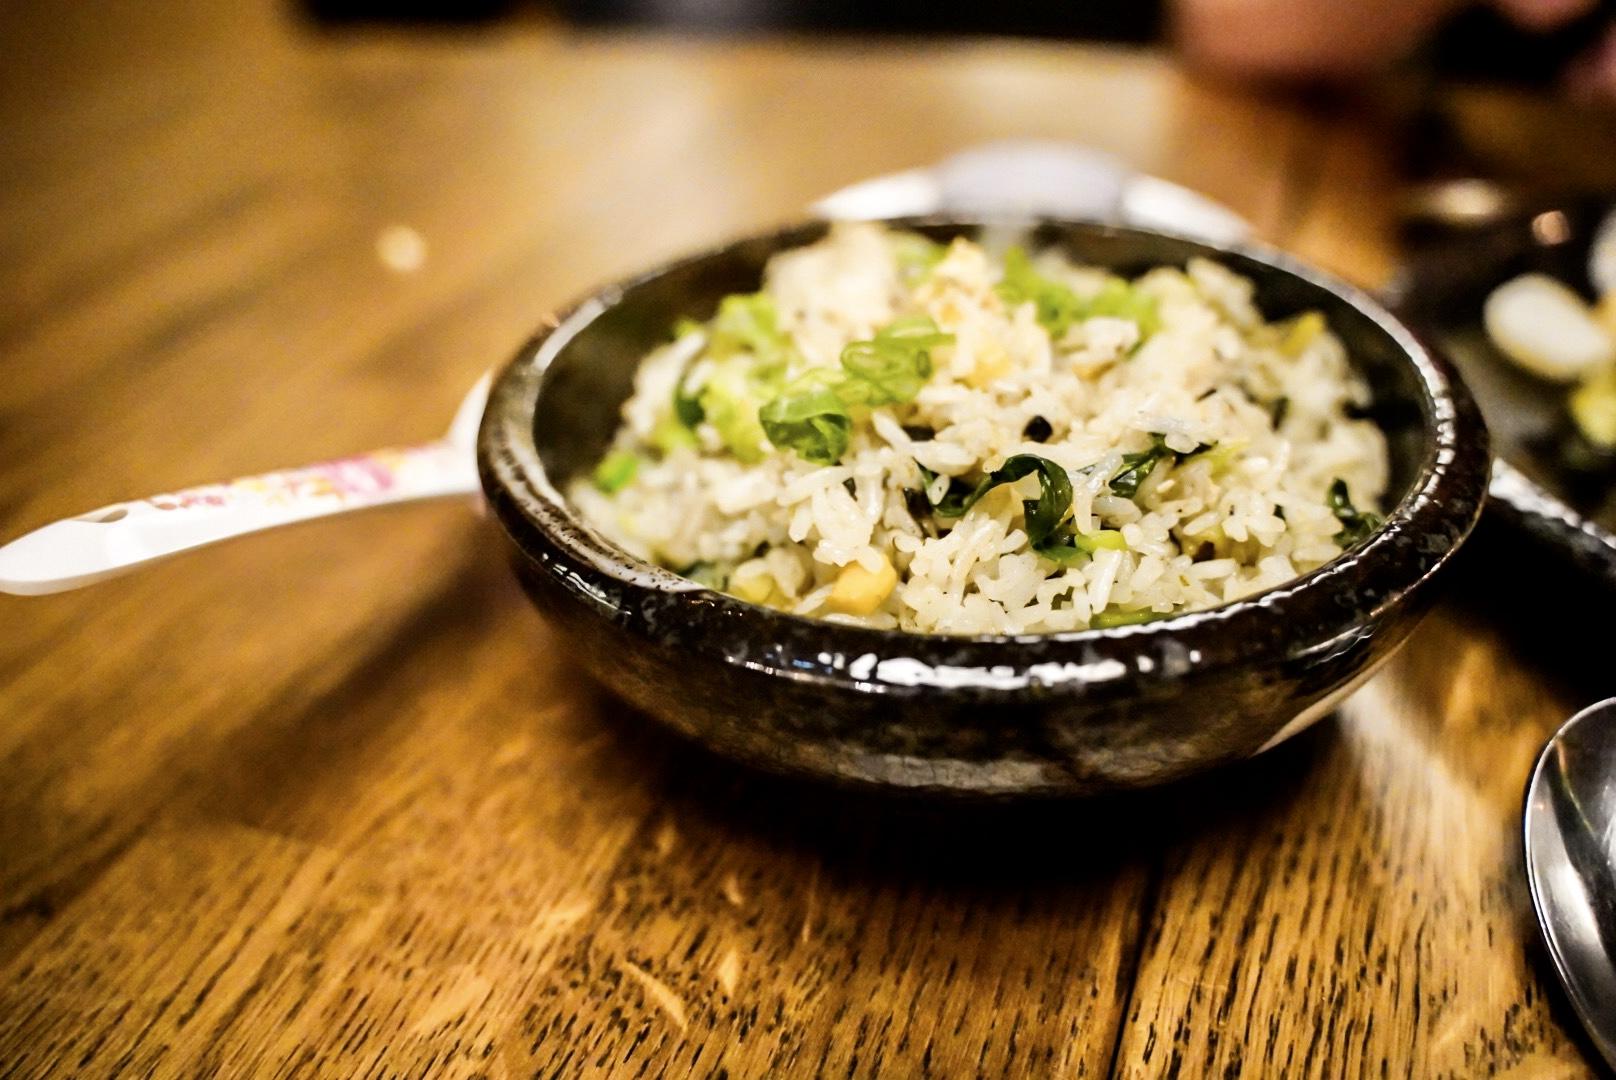 Sai Woo Fried Rice